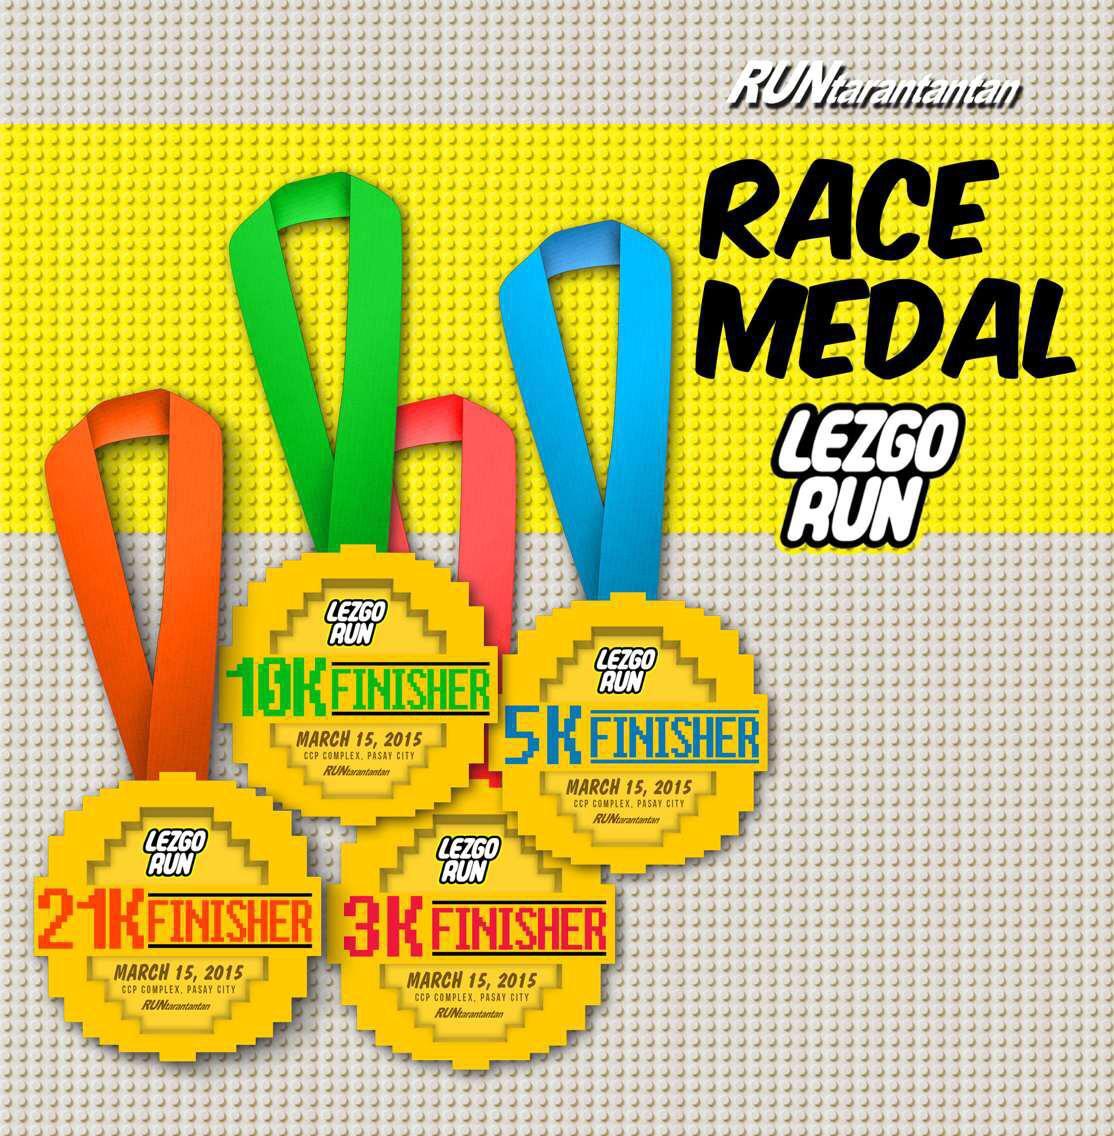 LezGo-Run-Medal